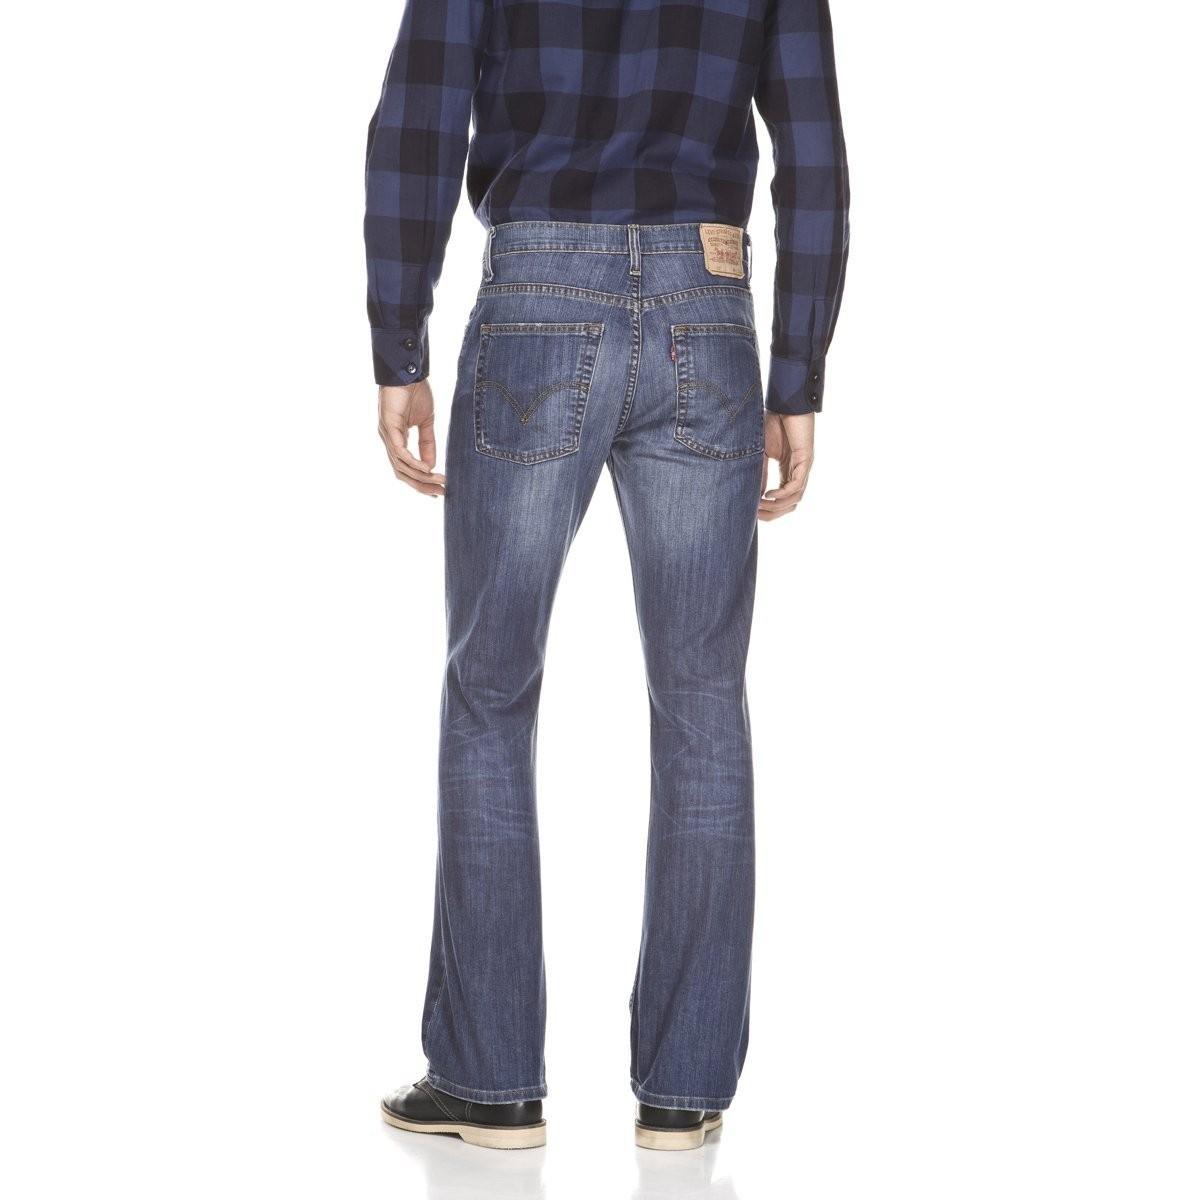 levi 39 s herren jeans 527 low bootcut blau kaufen. Black Bedroom Furniture Sets. Home Design Ideas